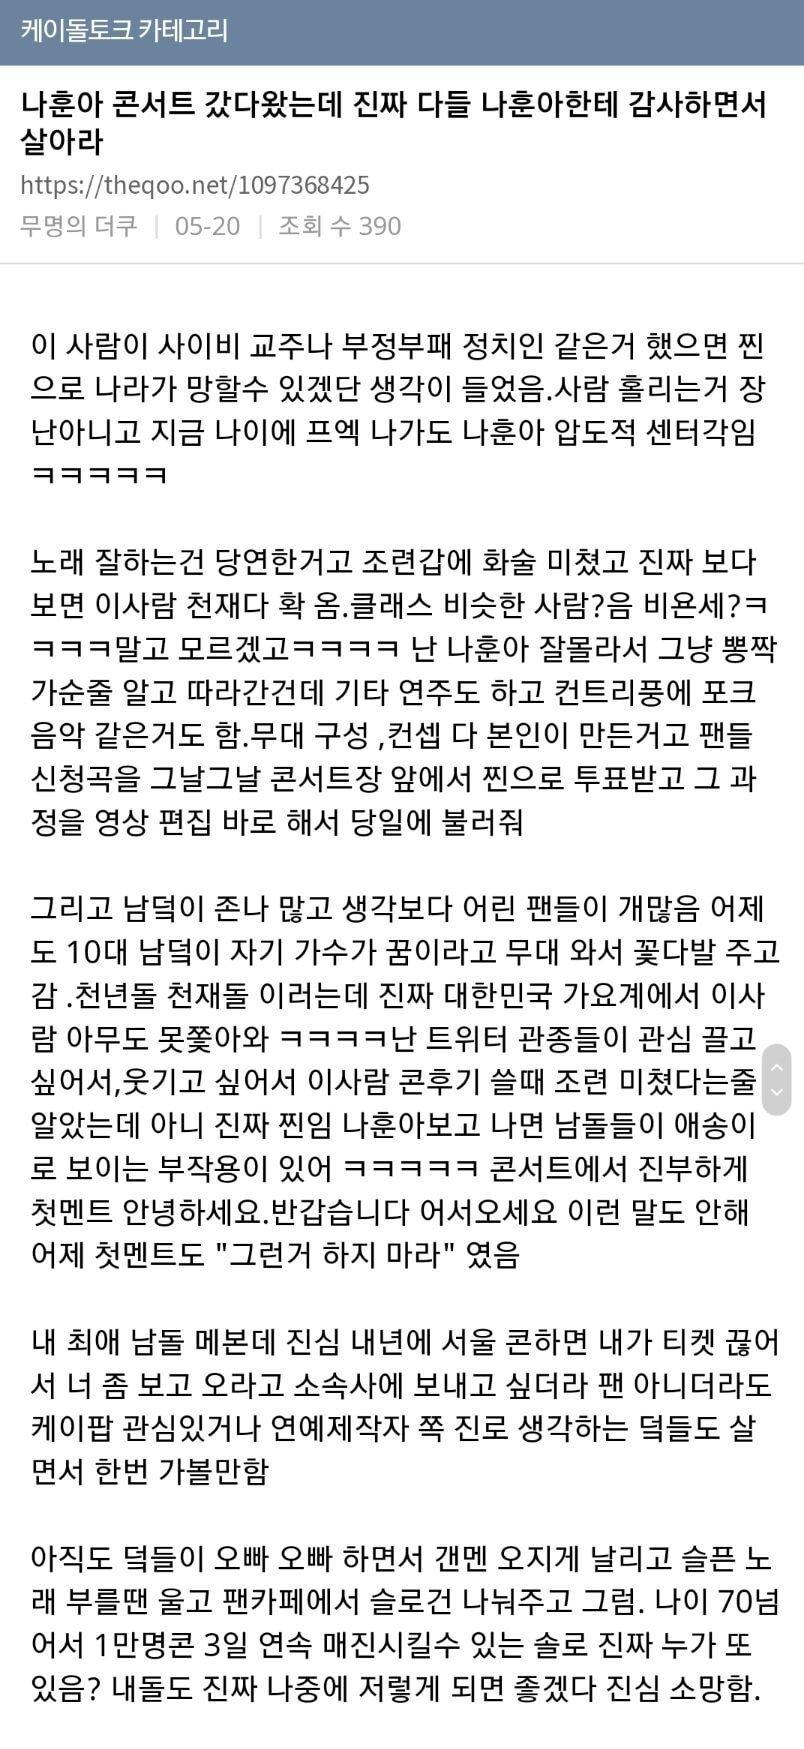 baseball_new9-20200930-223909-001.jpg 나훈아 형님 콘서트 본 20대 여자 후기